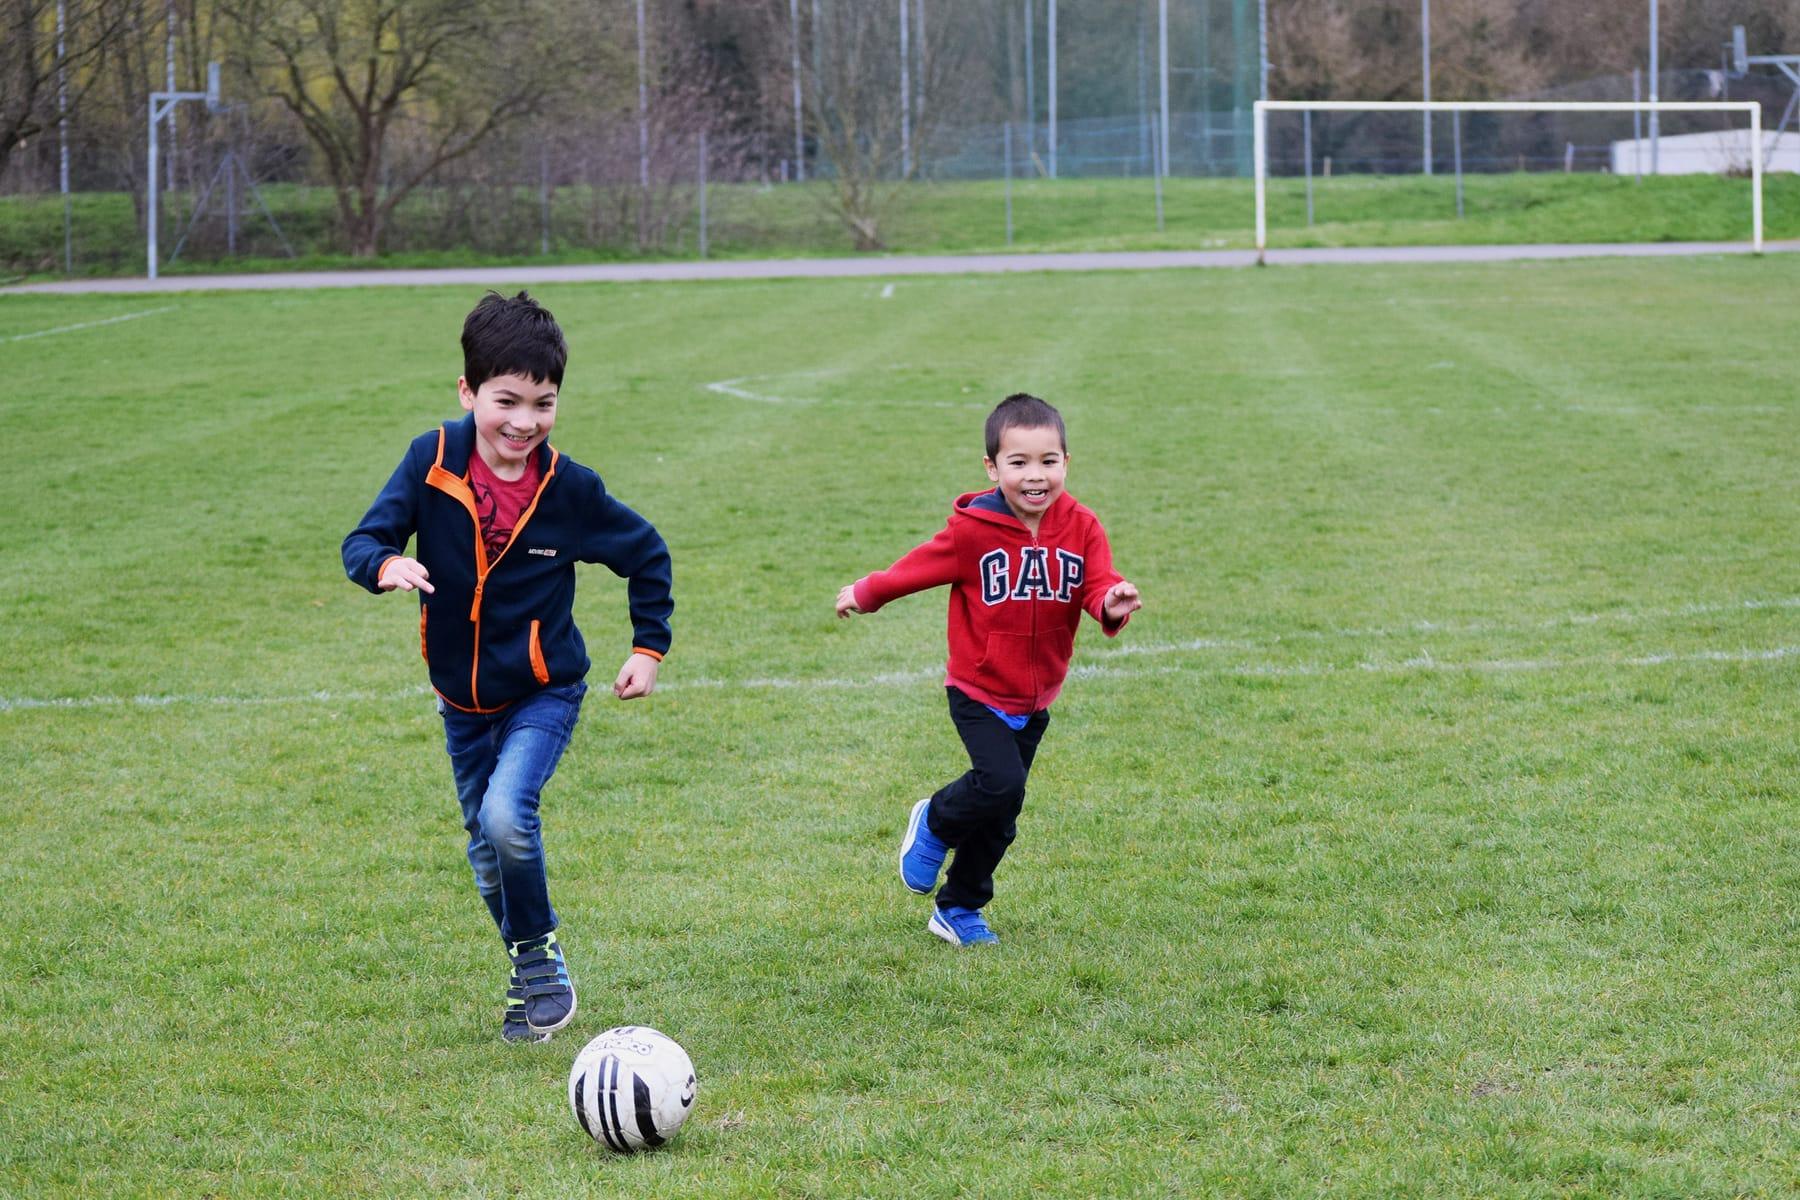 boys-playing-football-ft